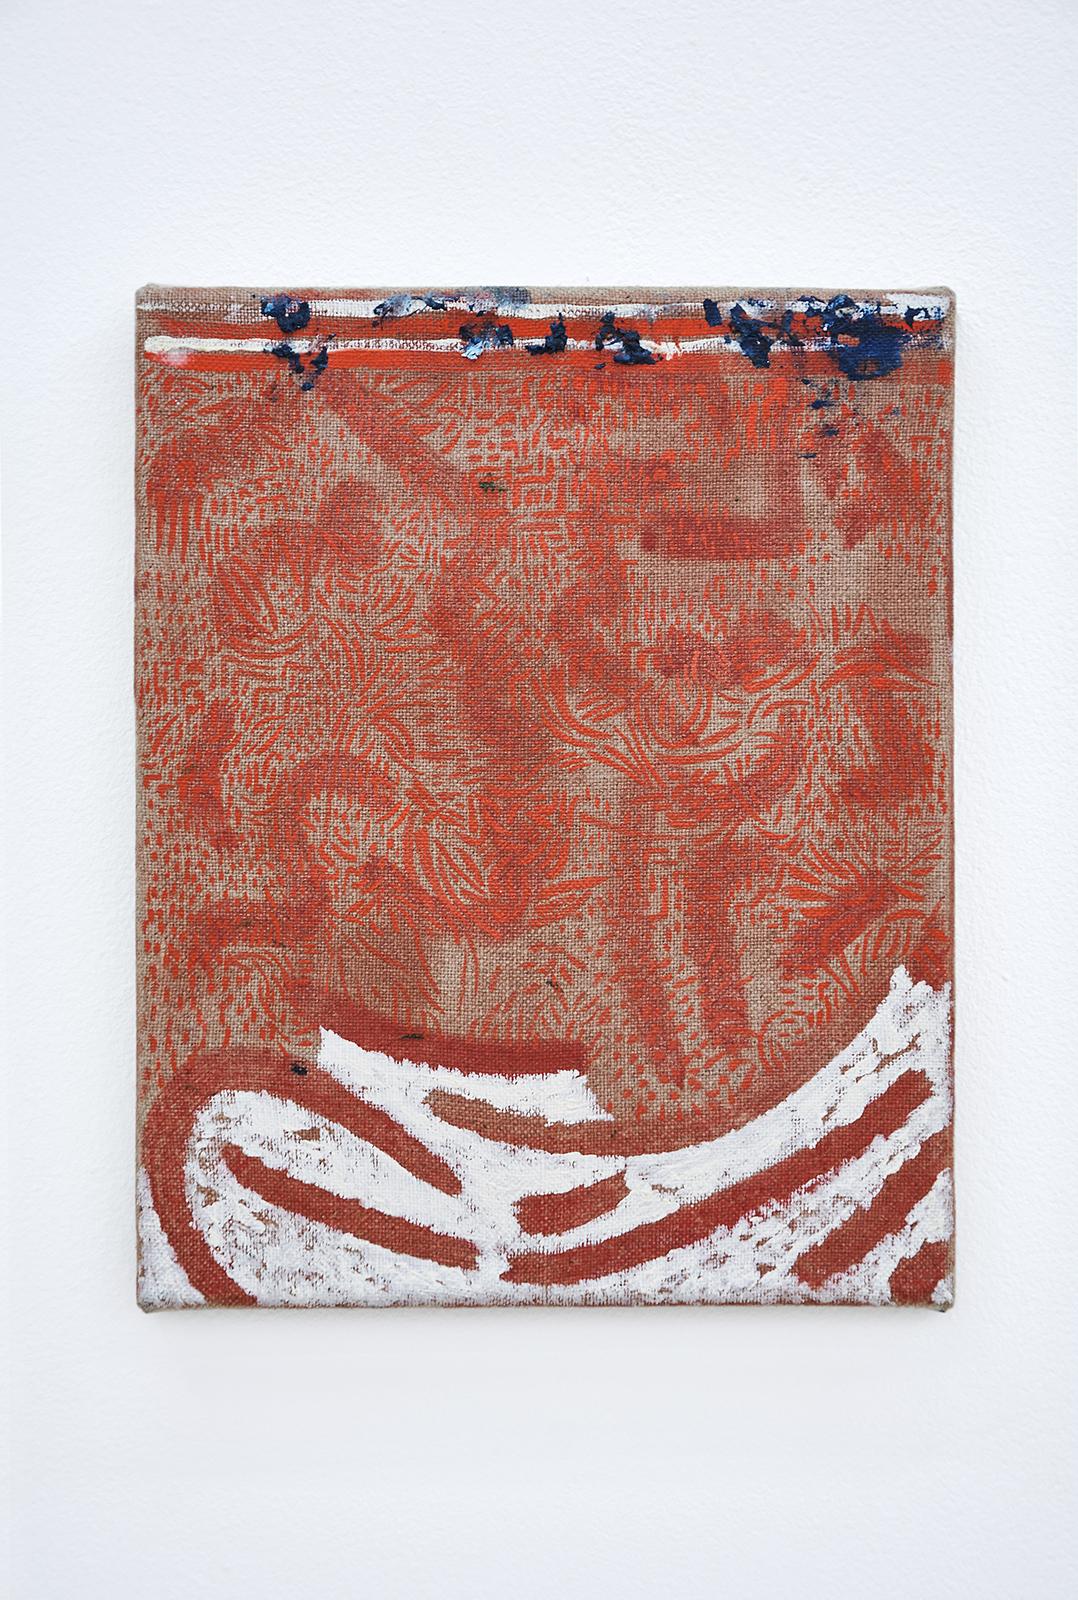 Anna Schachinger, Untitled, 2015. Oil on linen, 22 x 27 cm (8.5 x 10.5 in.)